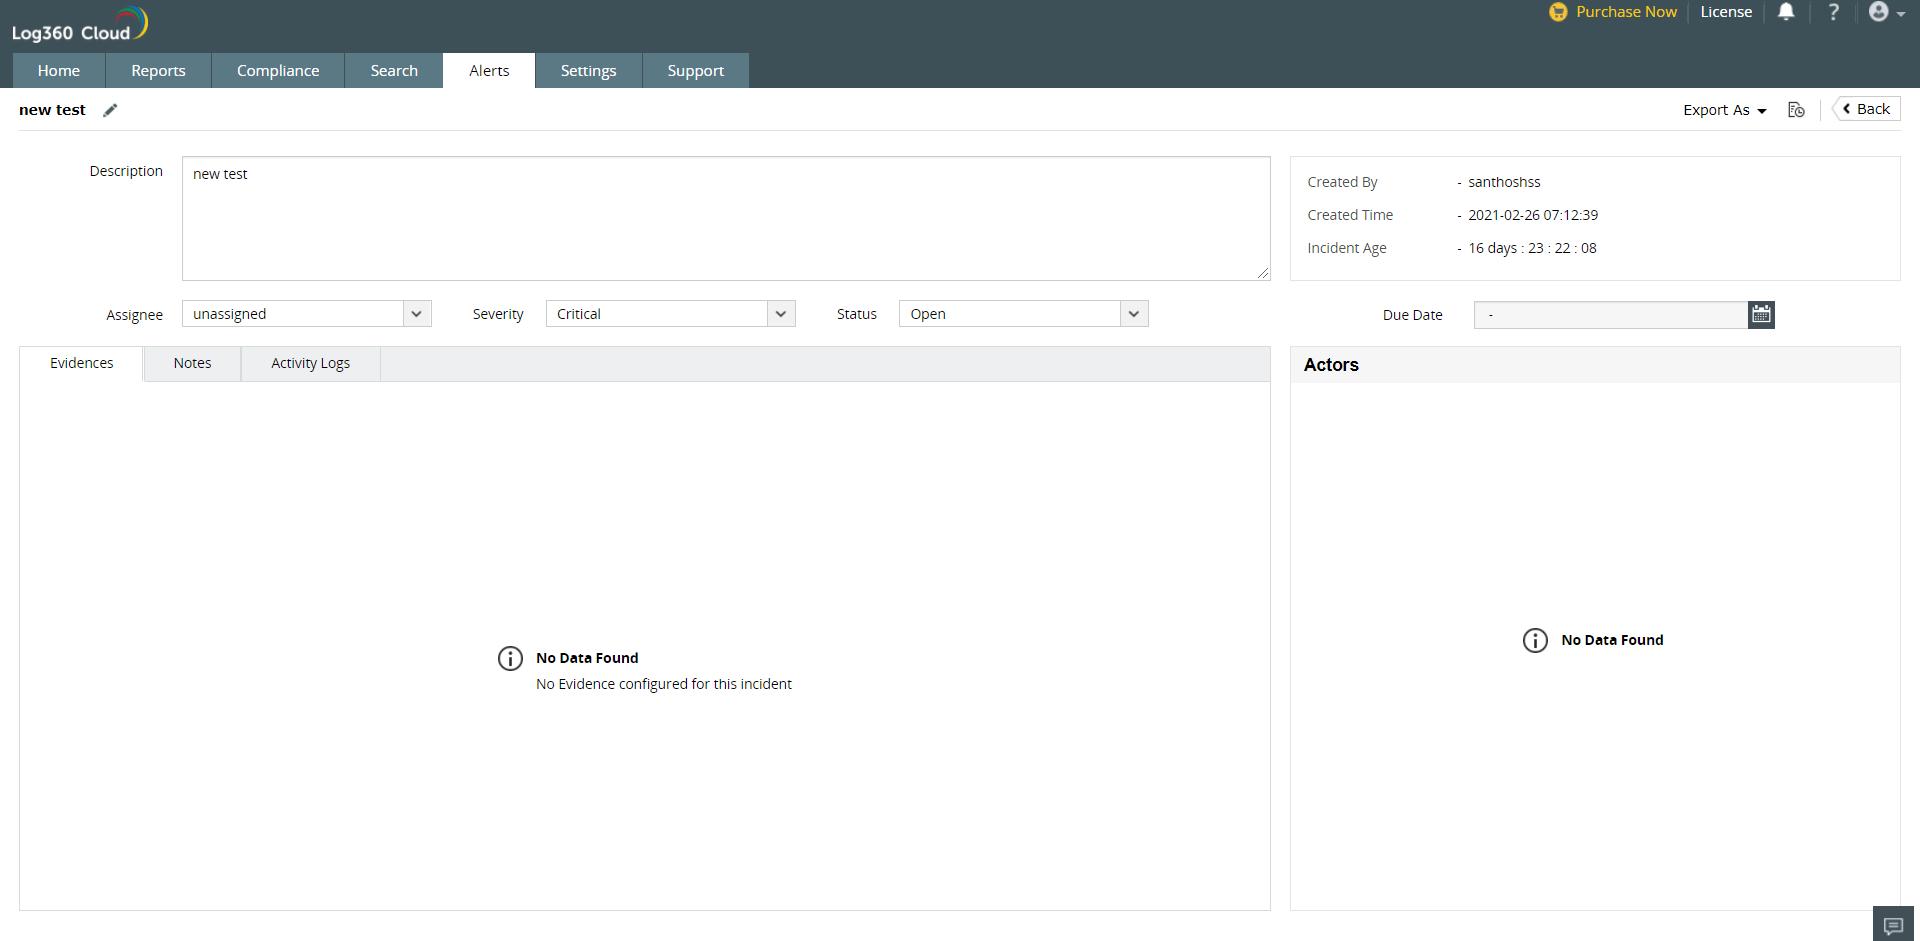 Incident Management in Log360 Cloud